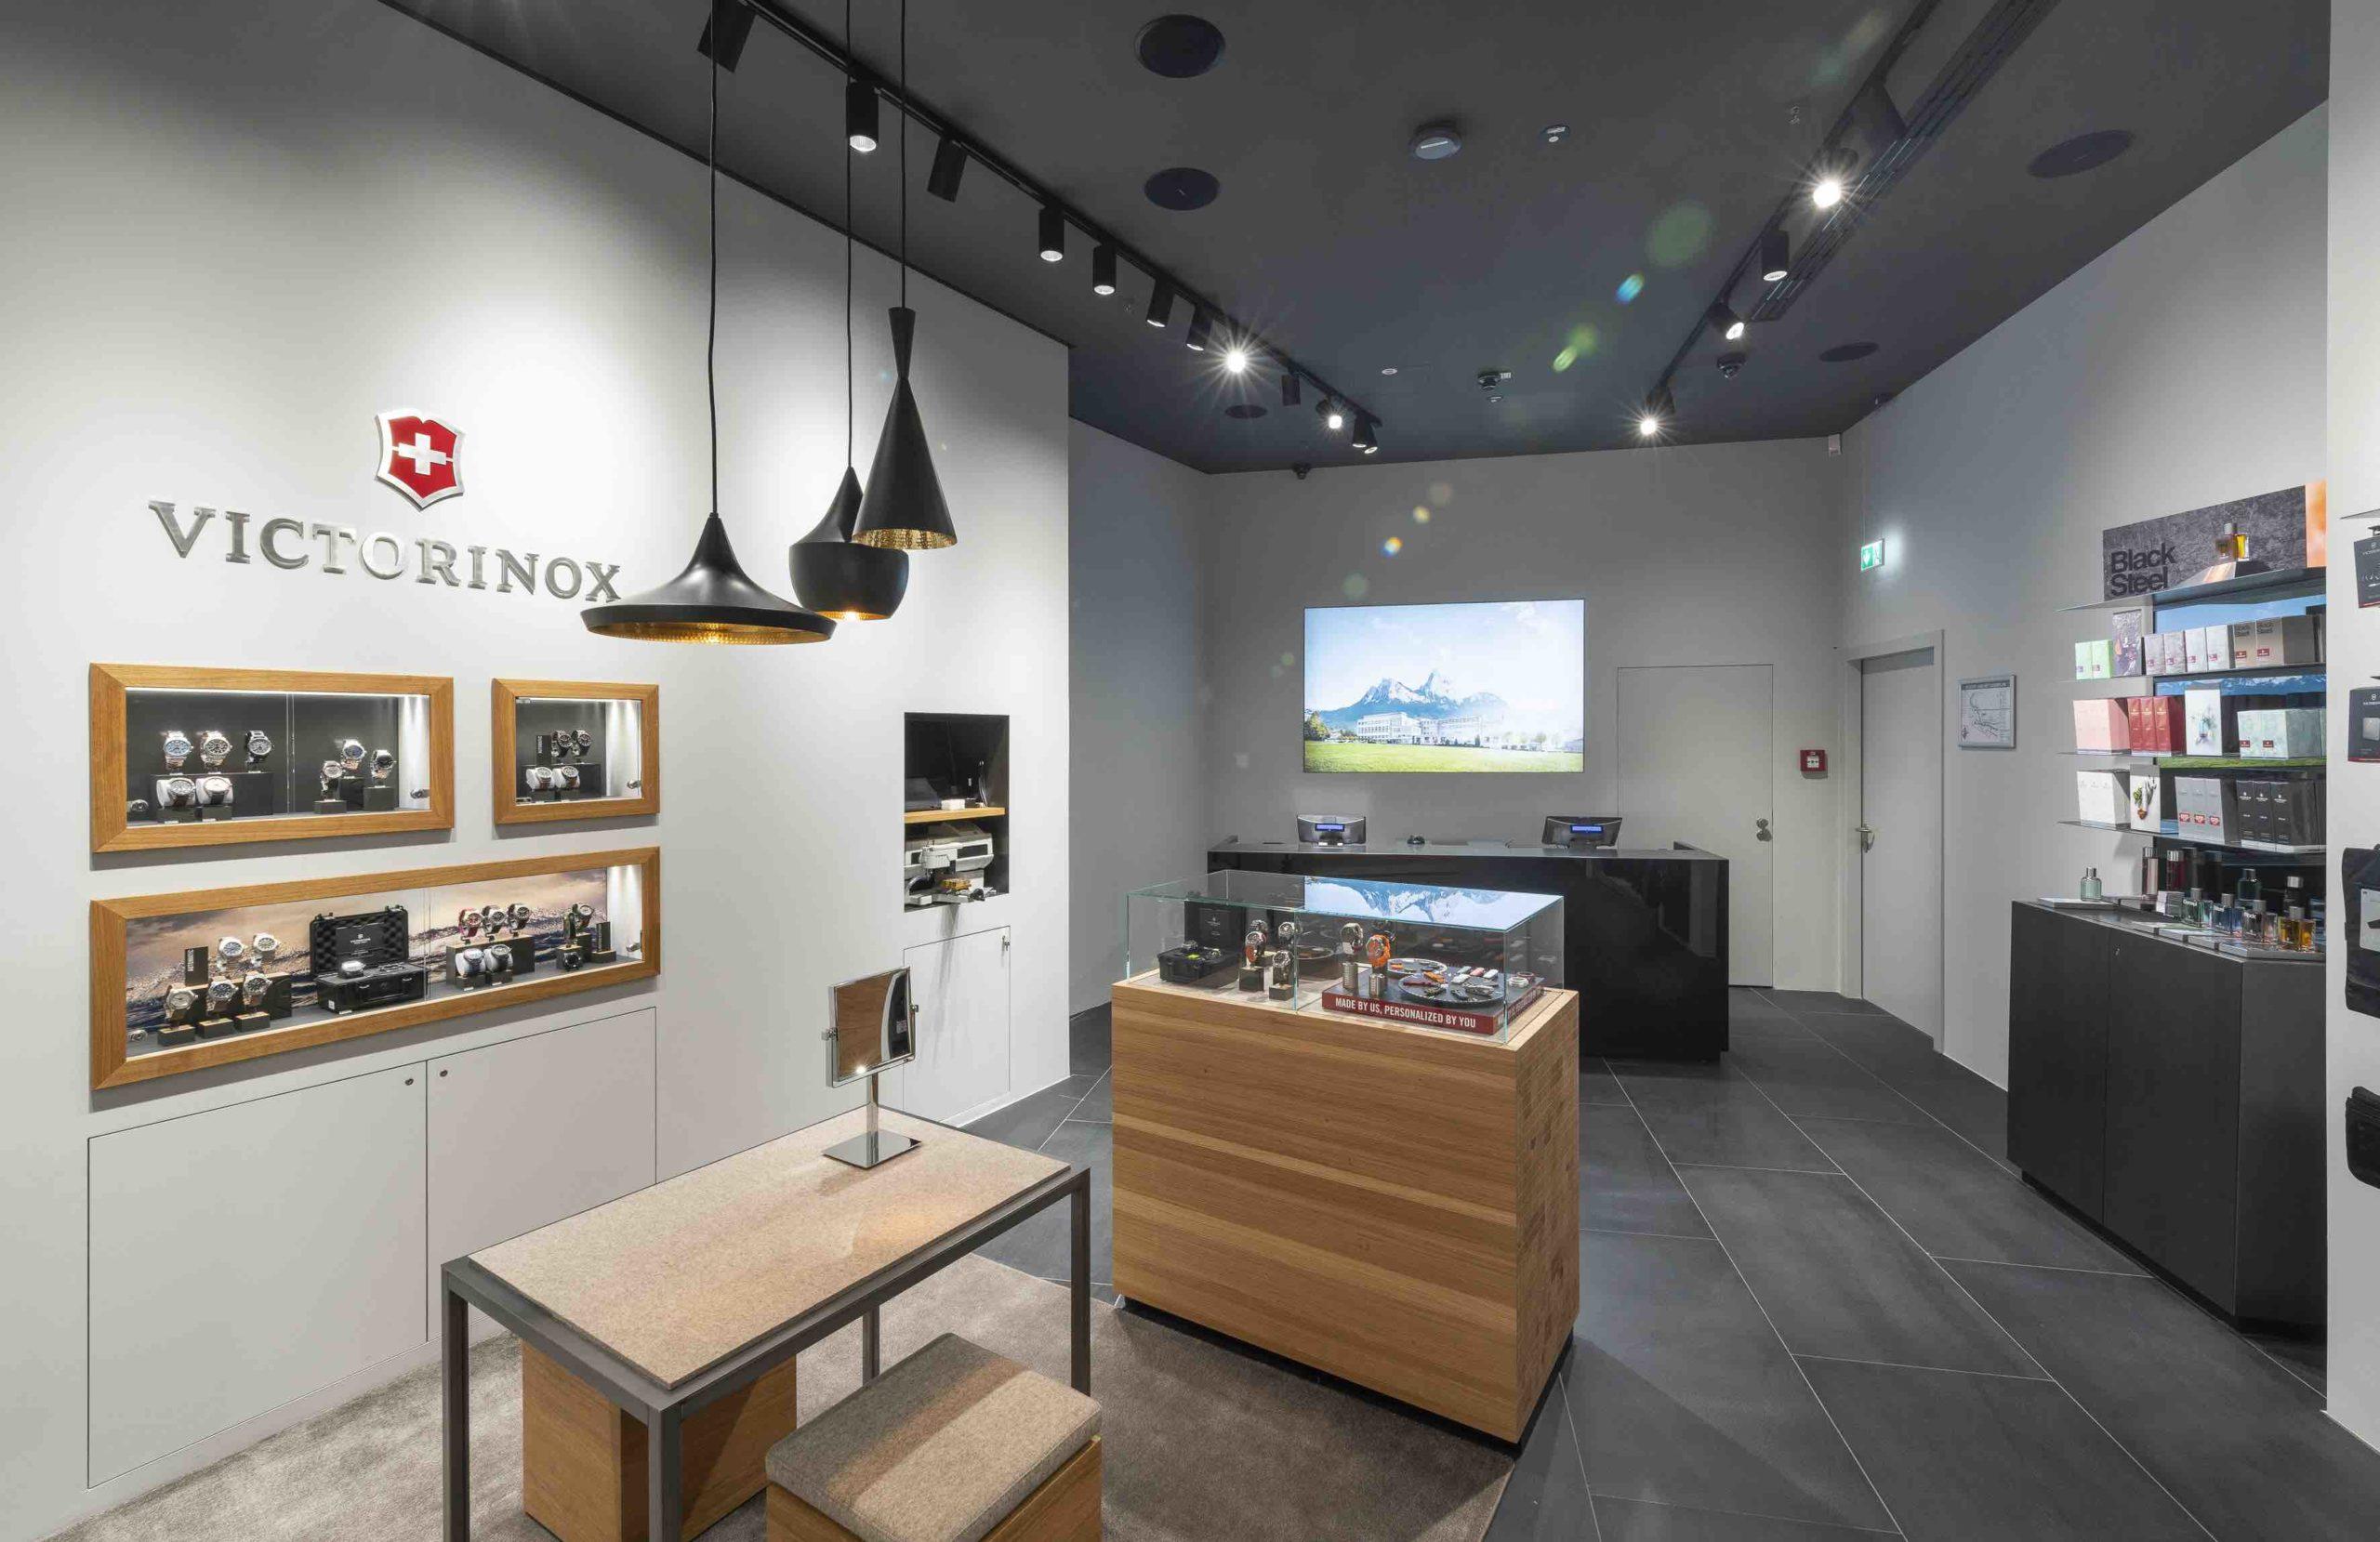 Victorinox eröffnet neuen Brand Store in Berlin